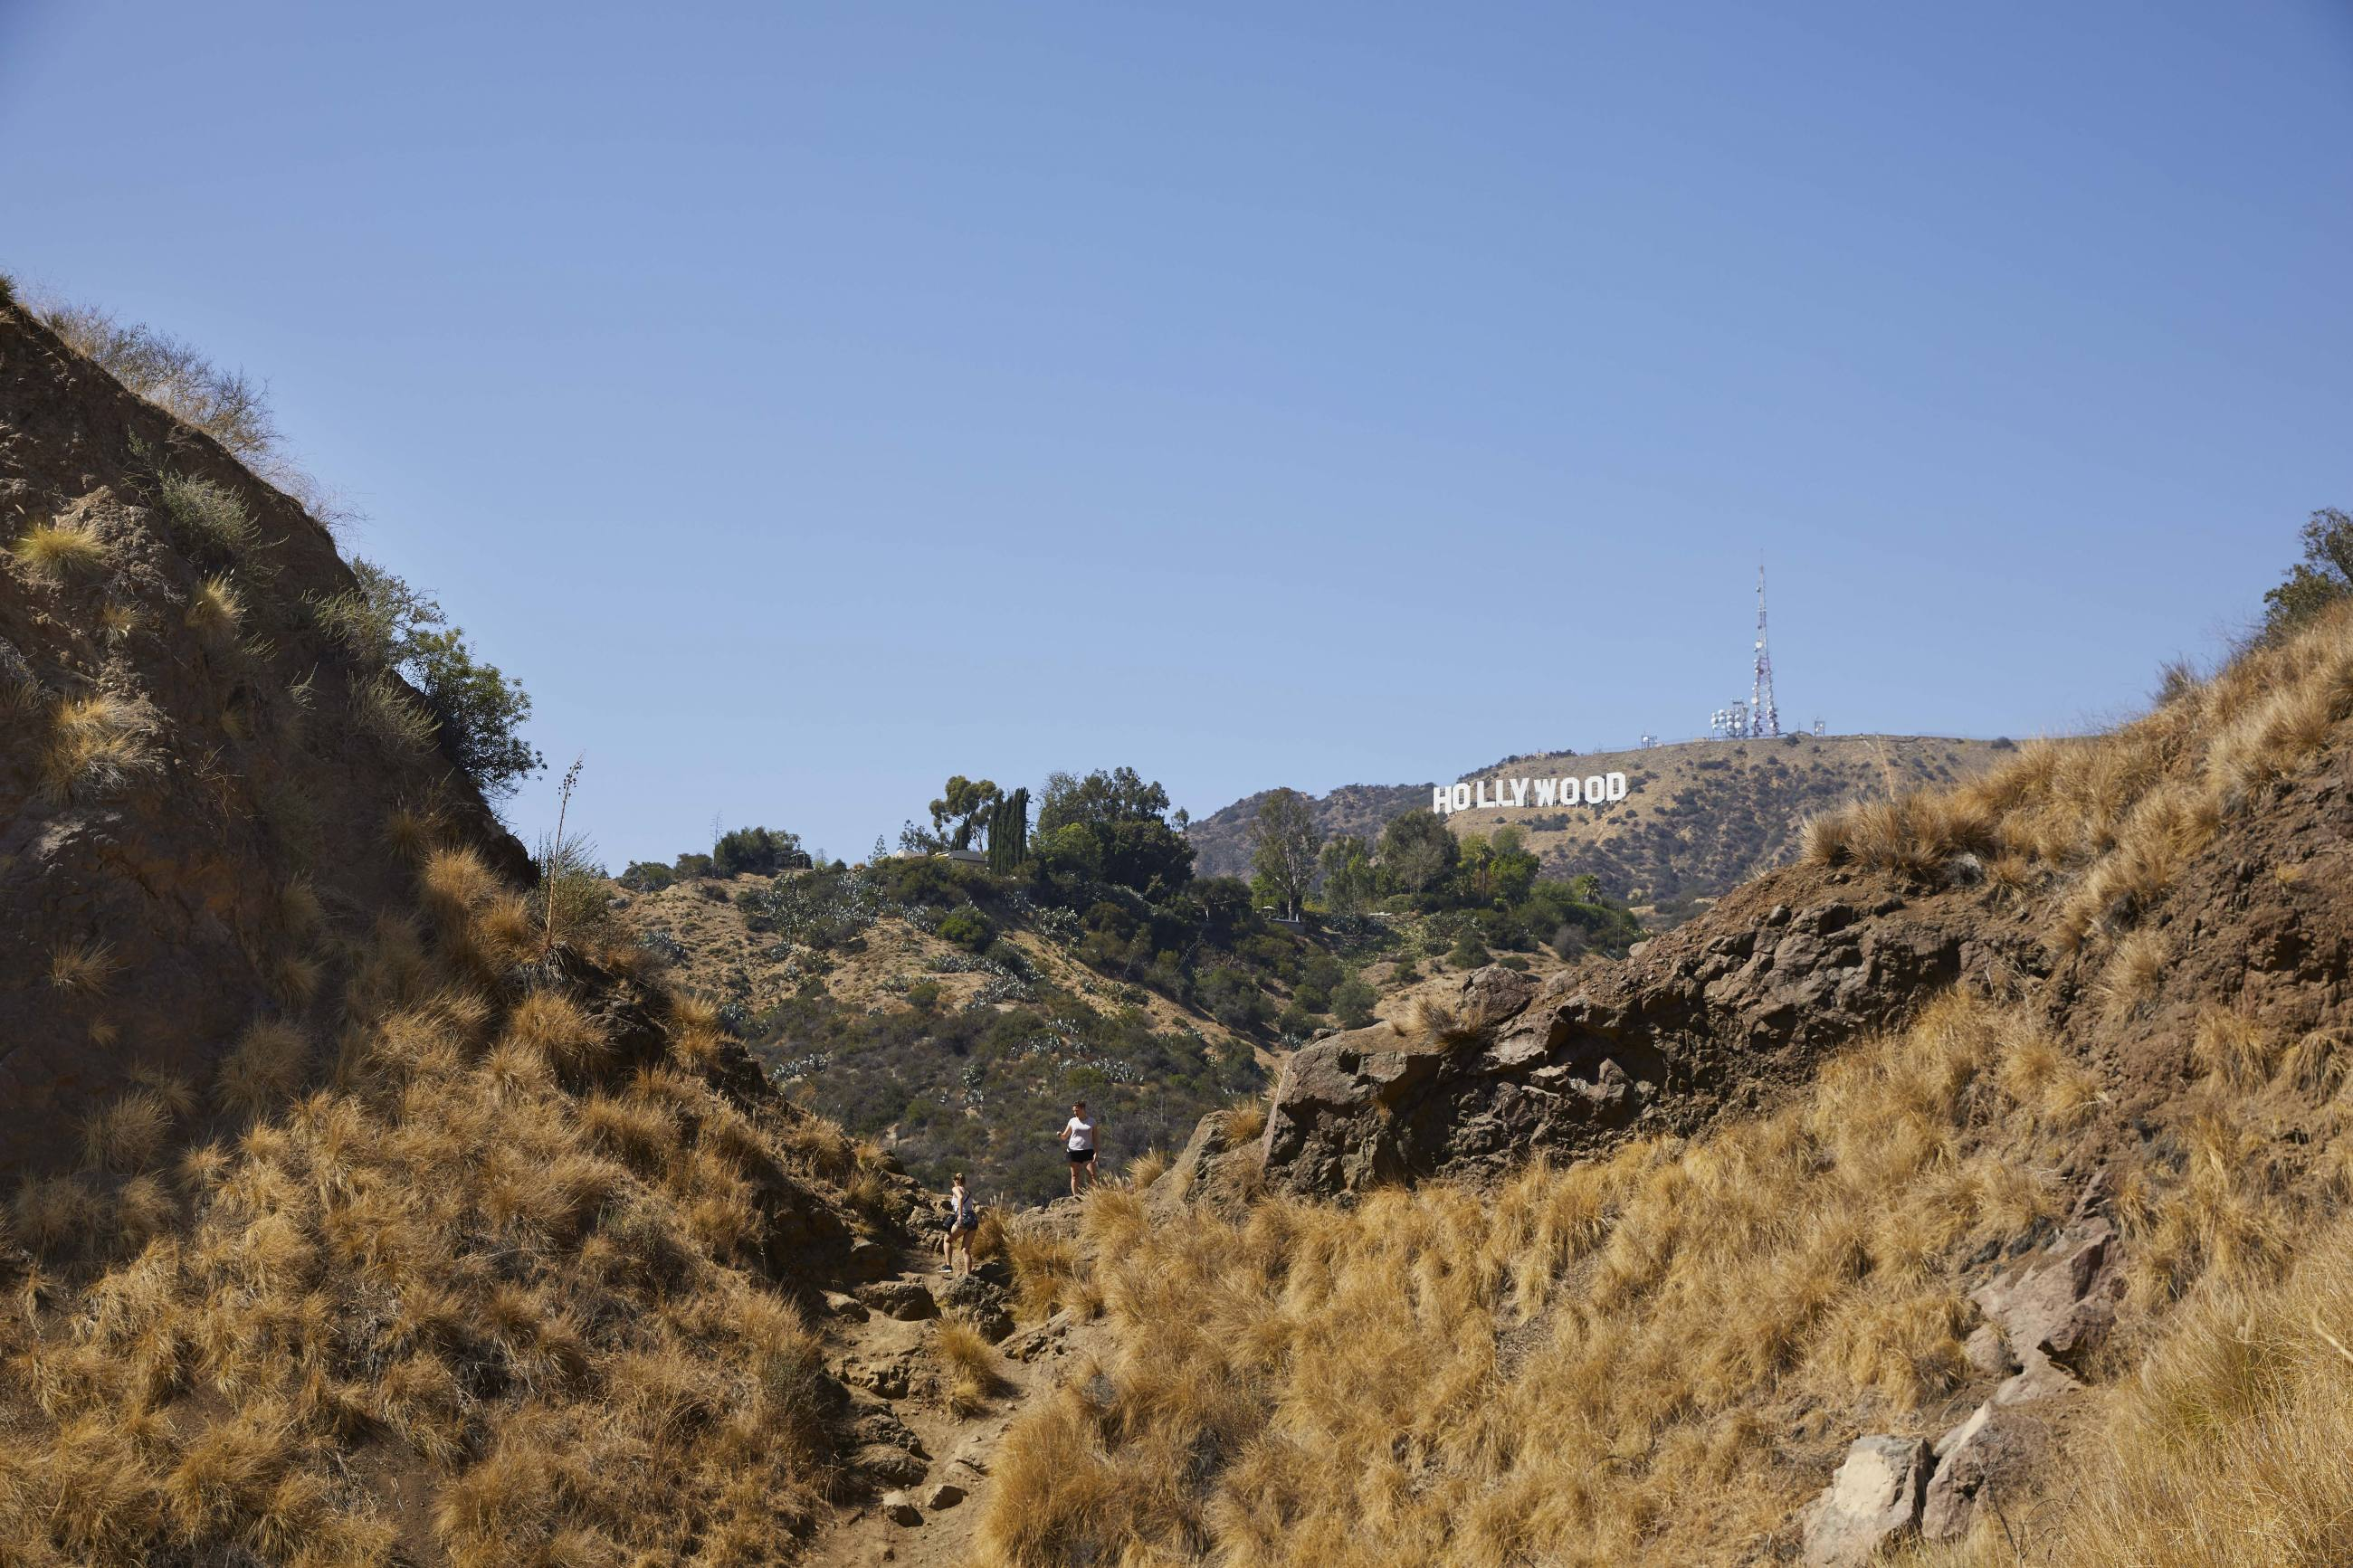 Bronson Canyon Hollywood Sign hikers